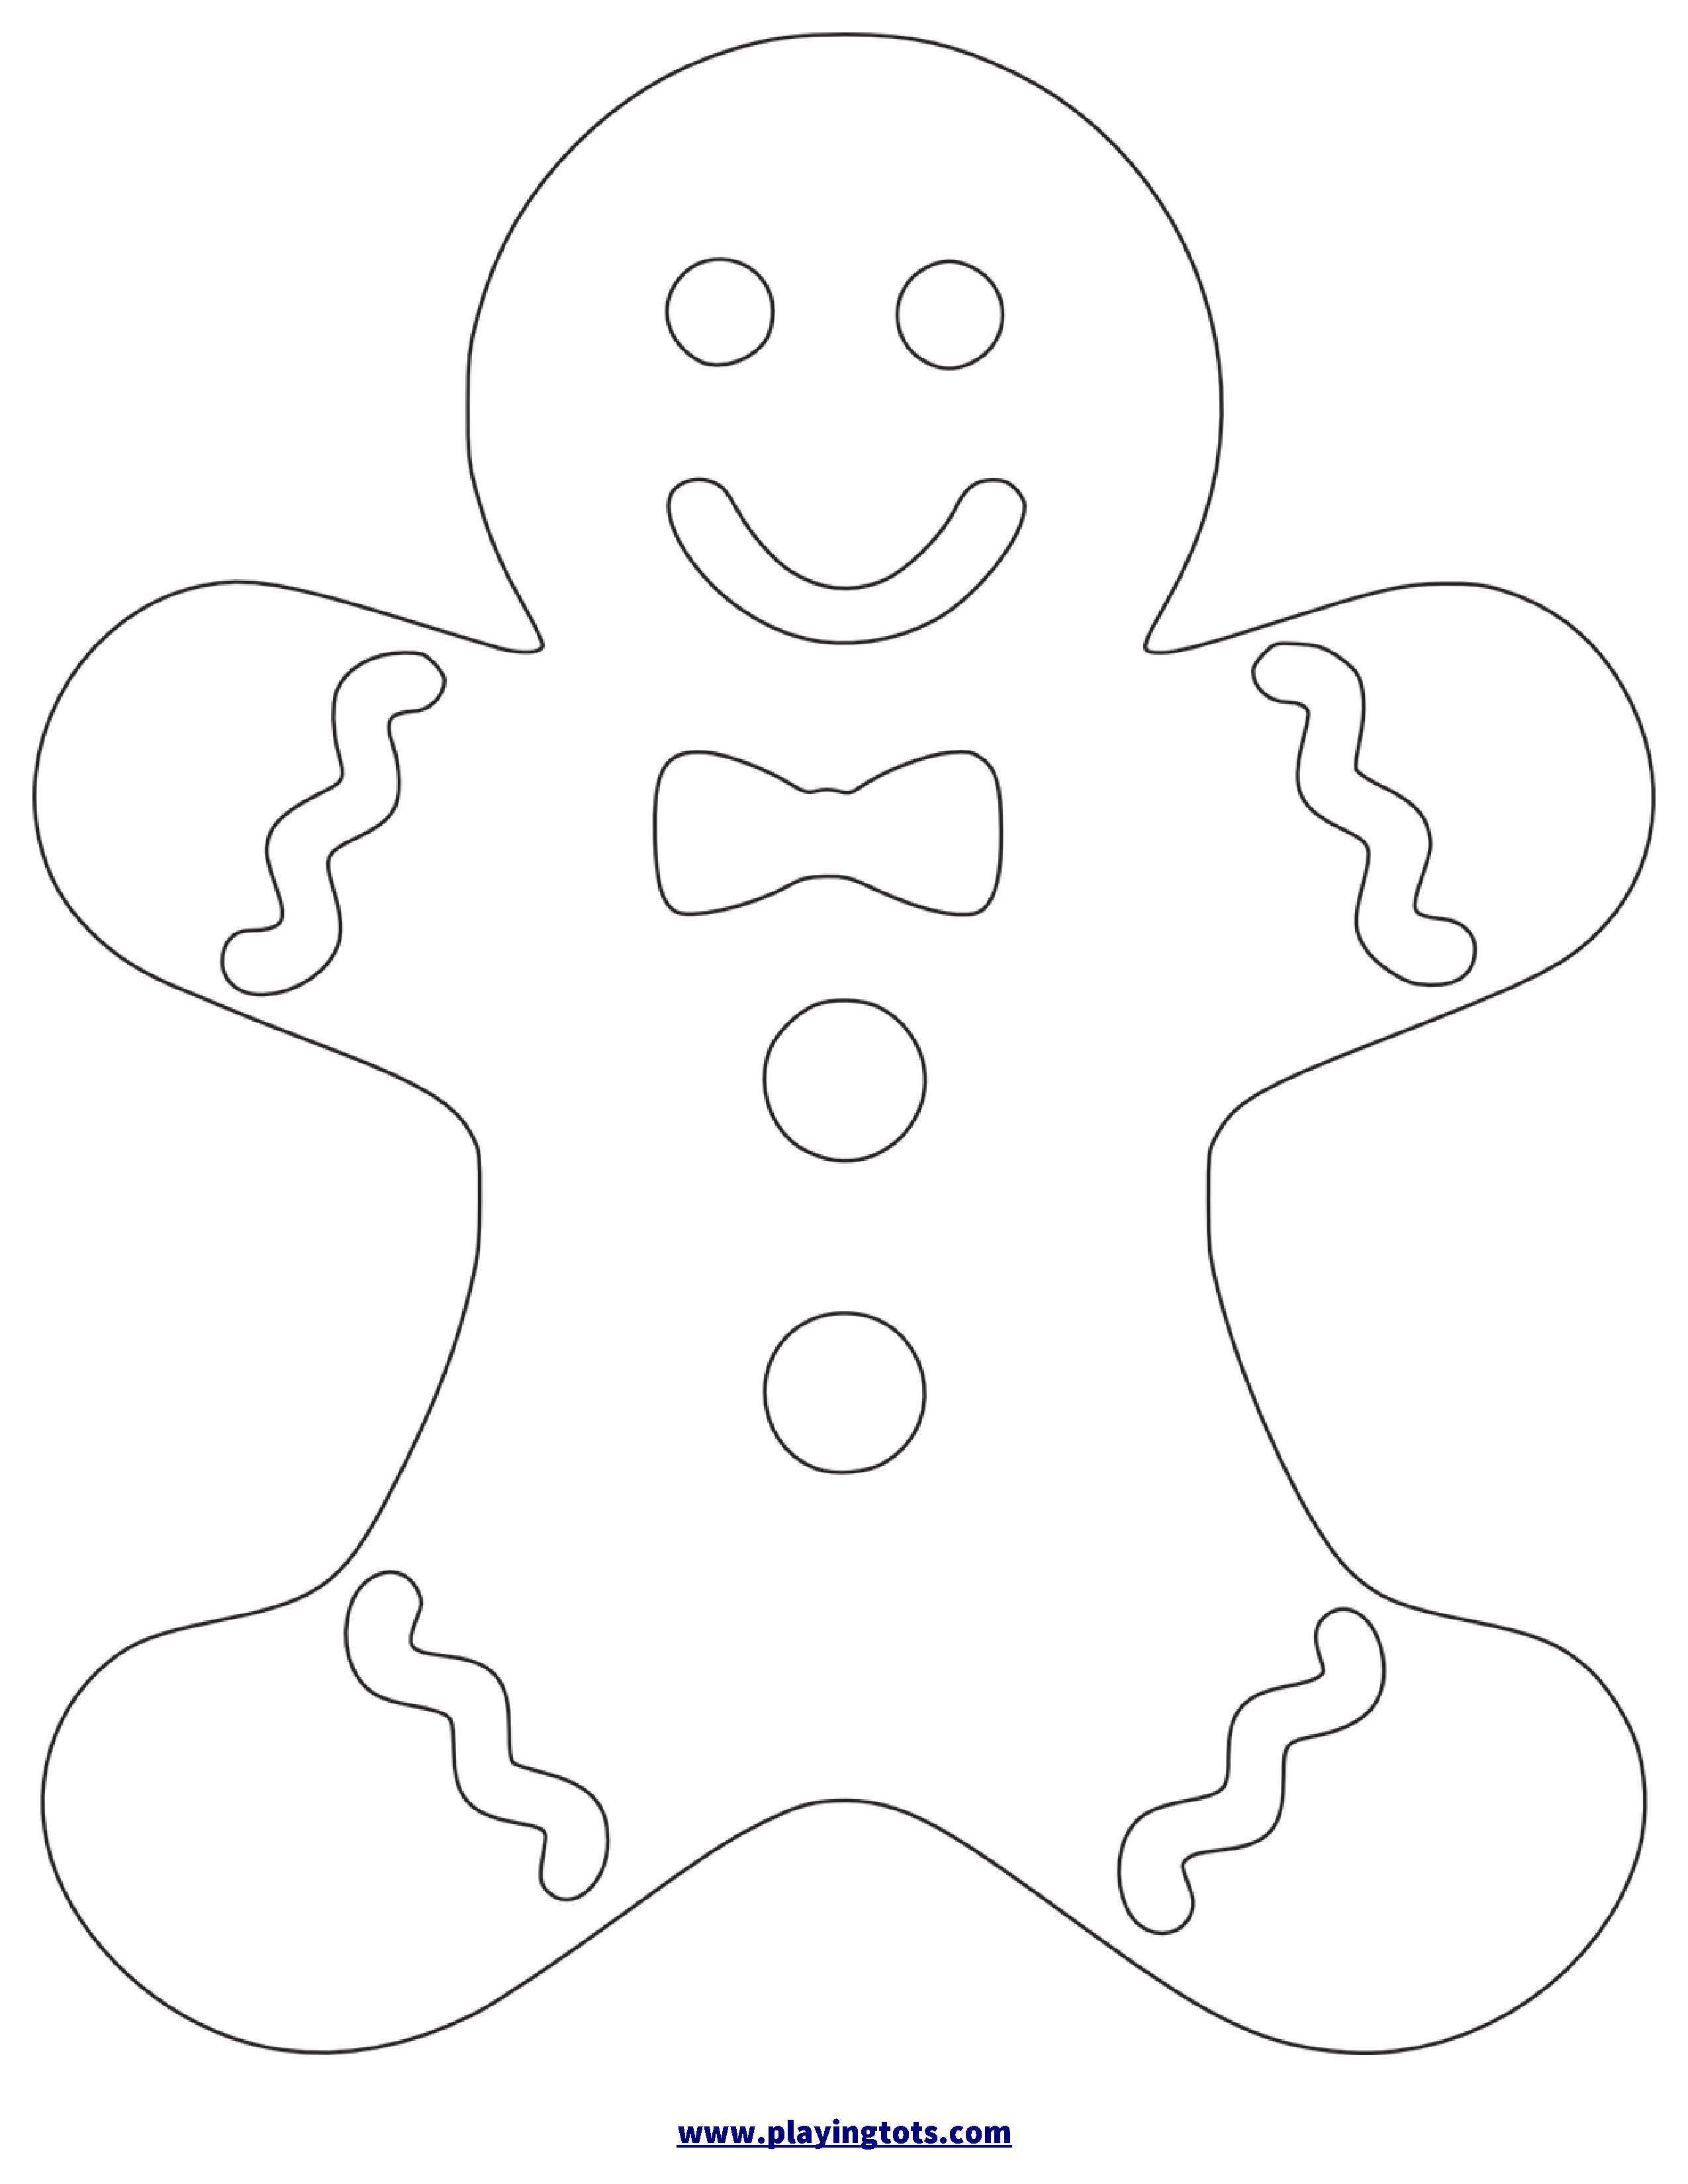 Free Printable Gingerbread Man Worksheet | Coloring Pages